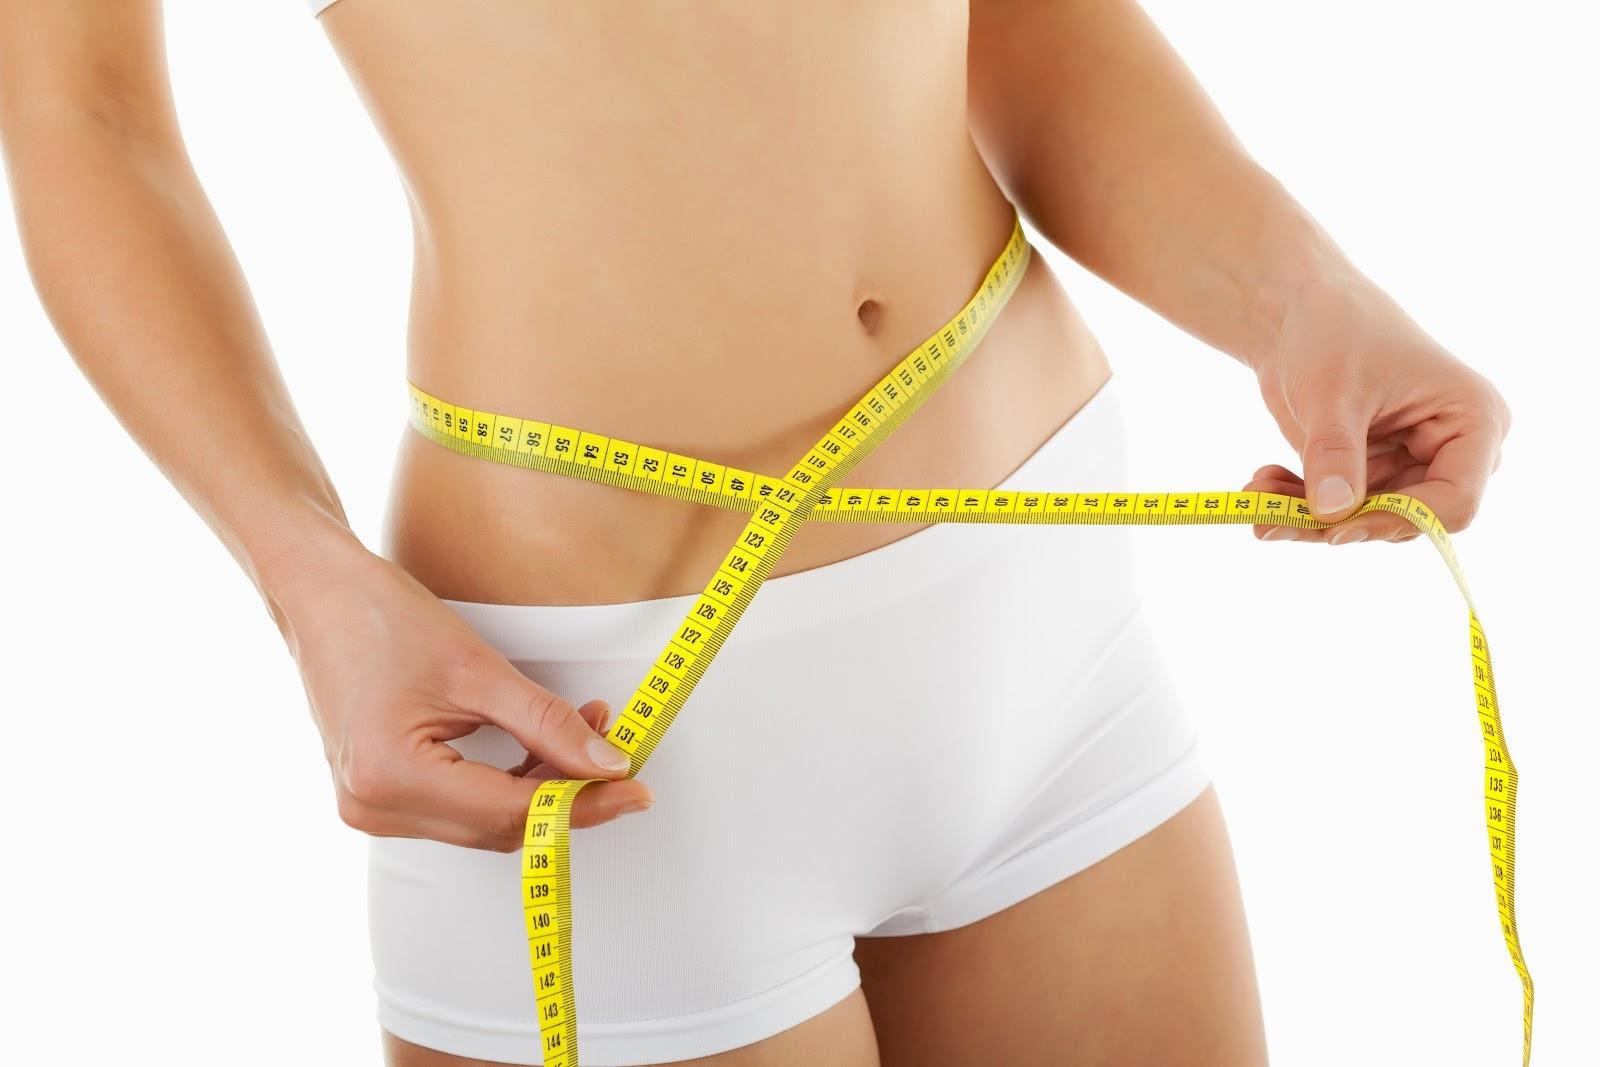 Vantagem de gengibre de mulheres por perda de peso